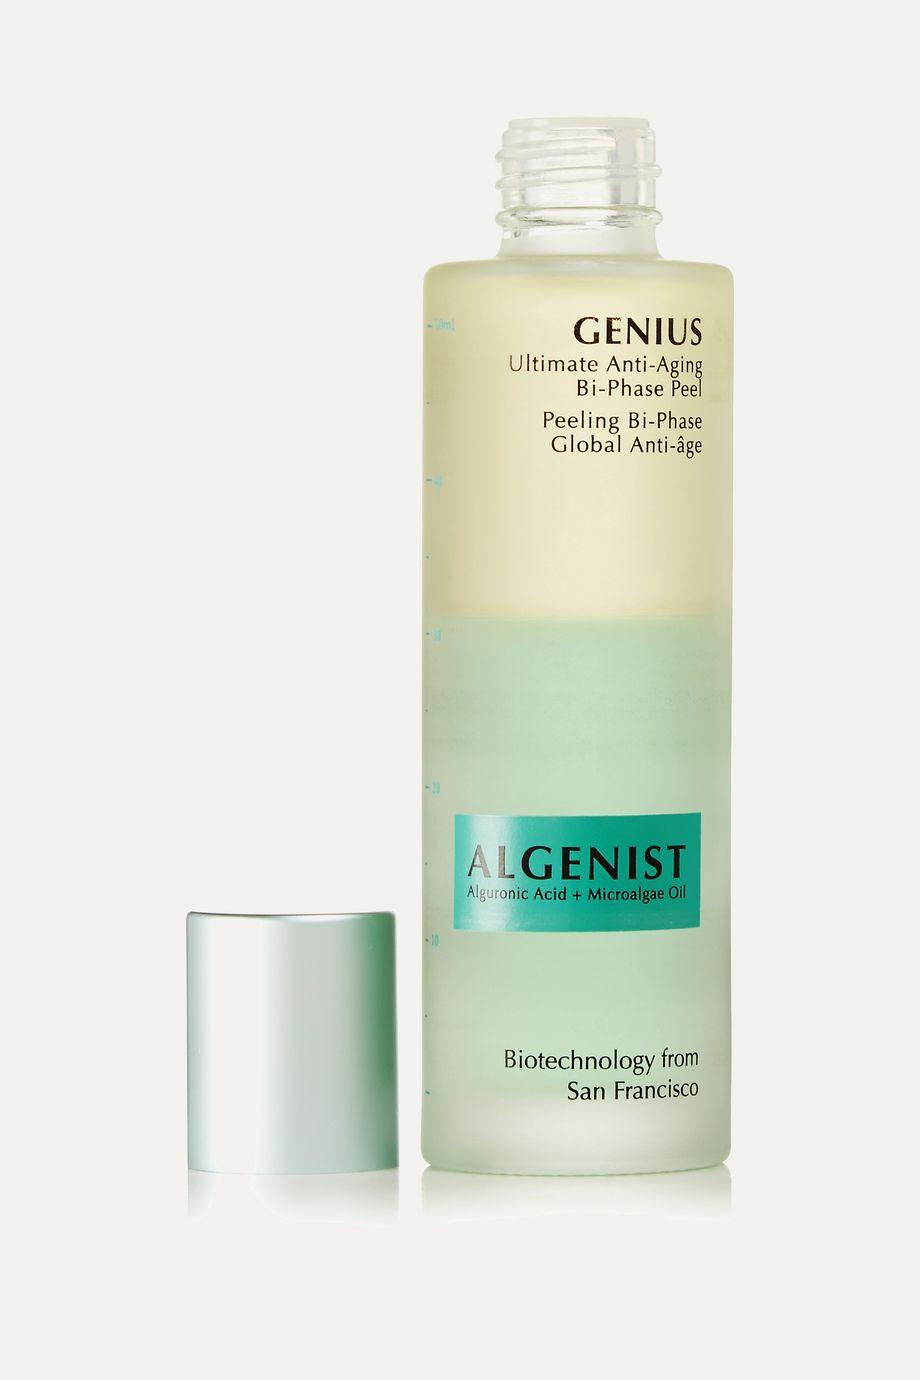 Algenist GENIUS Ultimate Anti-Aging Bi-Phase Peel, 50ml